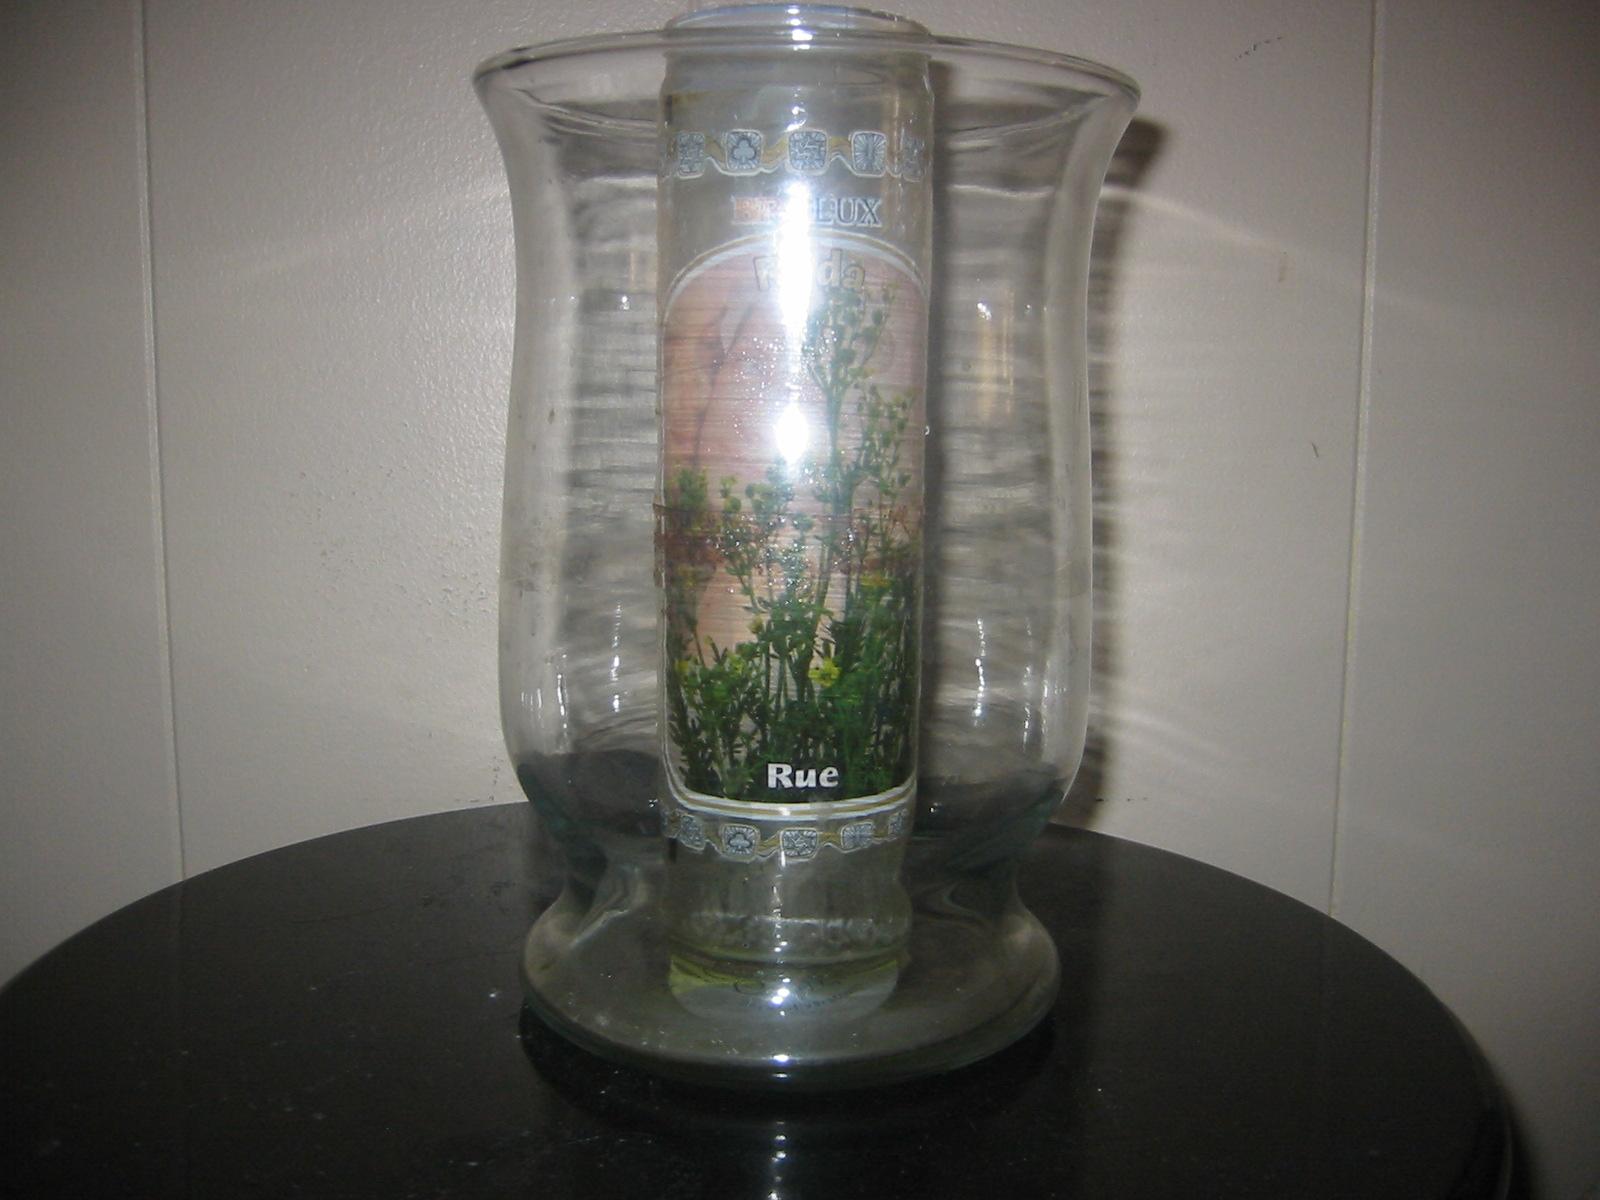 Herbs | Rue, Ruda